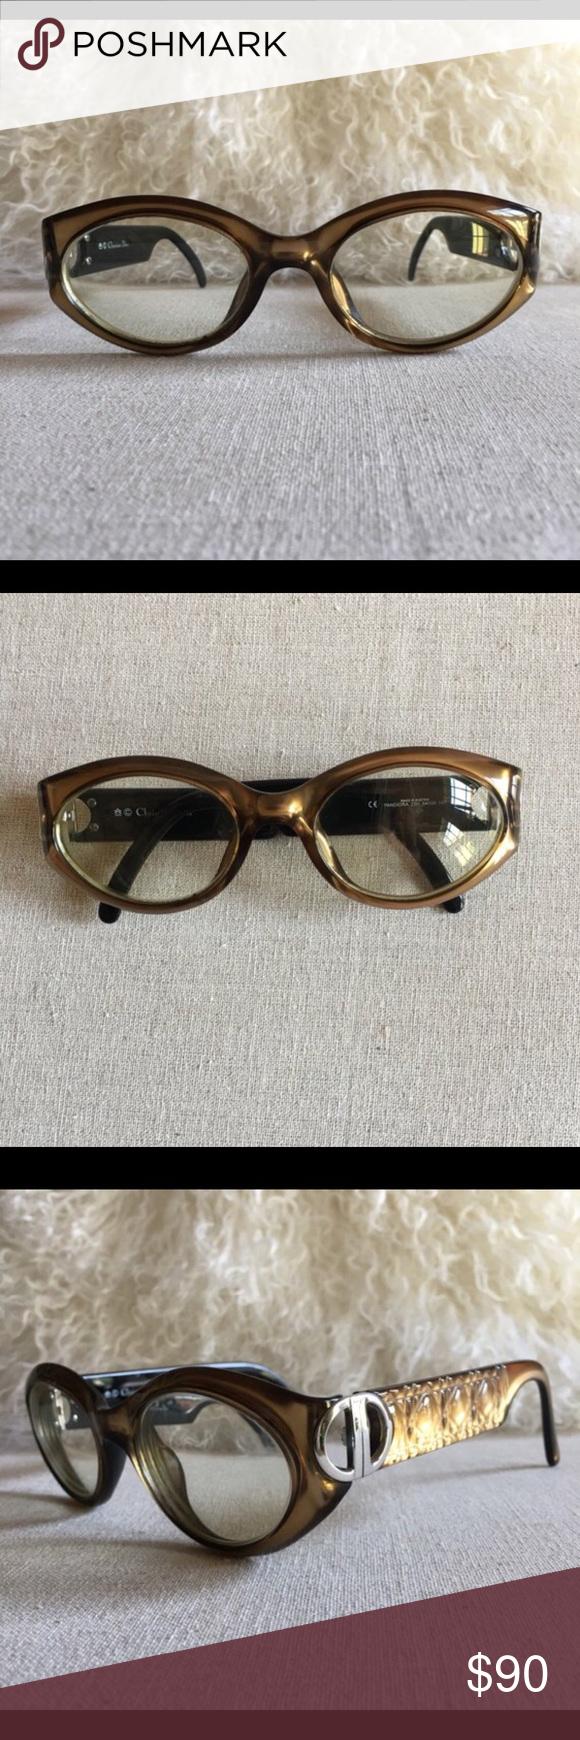 a6e41c3906b Vintage Christian Dior Khaki Gold Sunglasses These khaki bronzish gold eye  sunglasses by Christian Dior